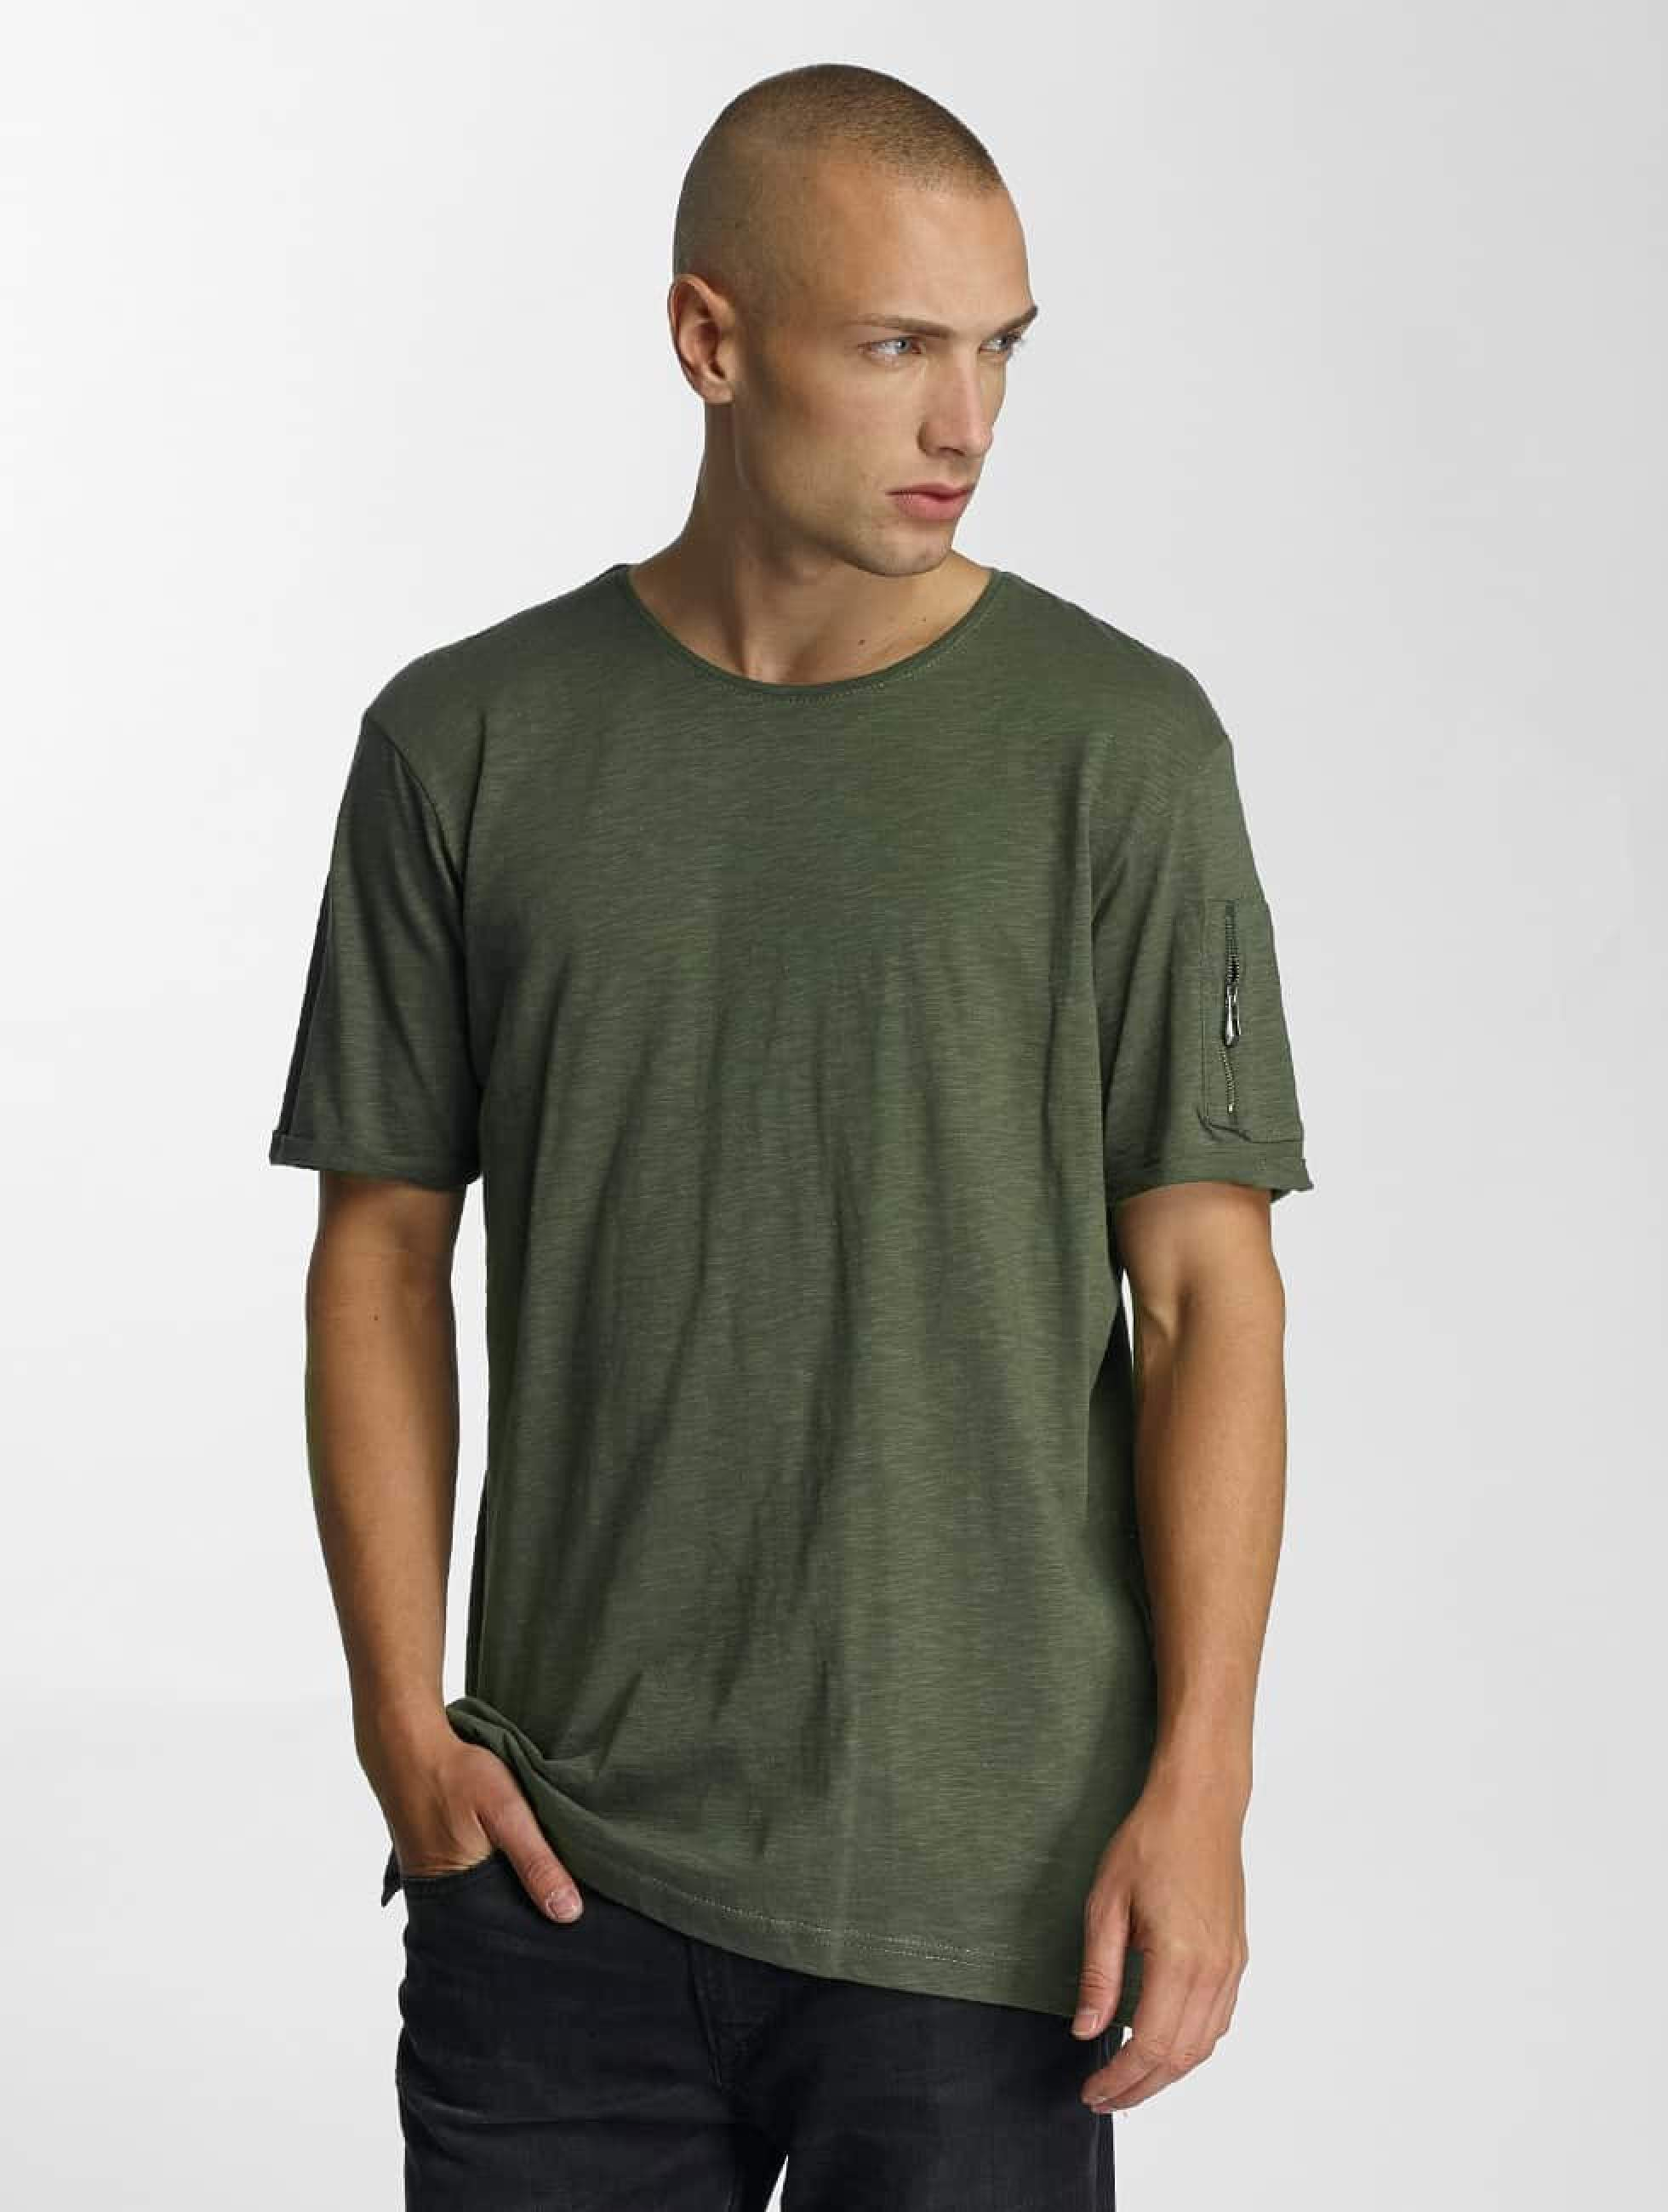 Who Shot Ya? / T-Shirt Haora in olive S